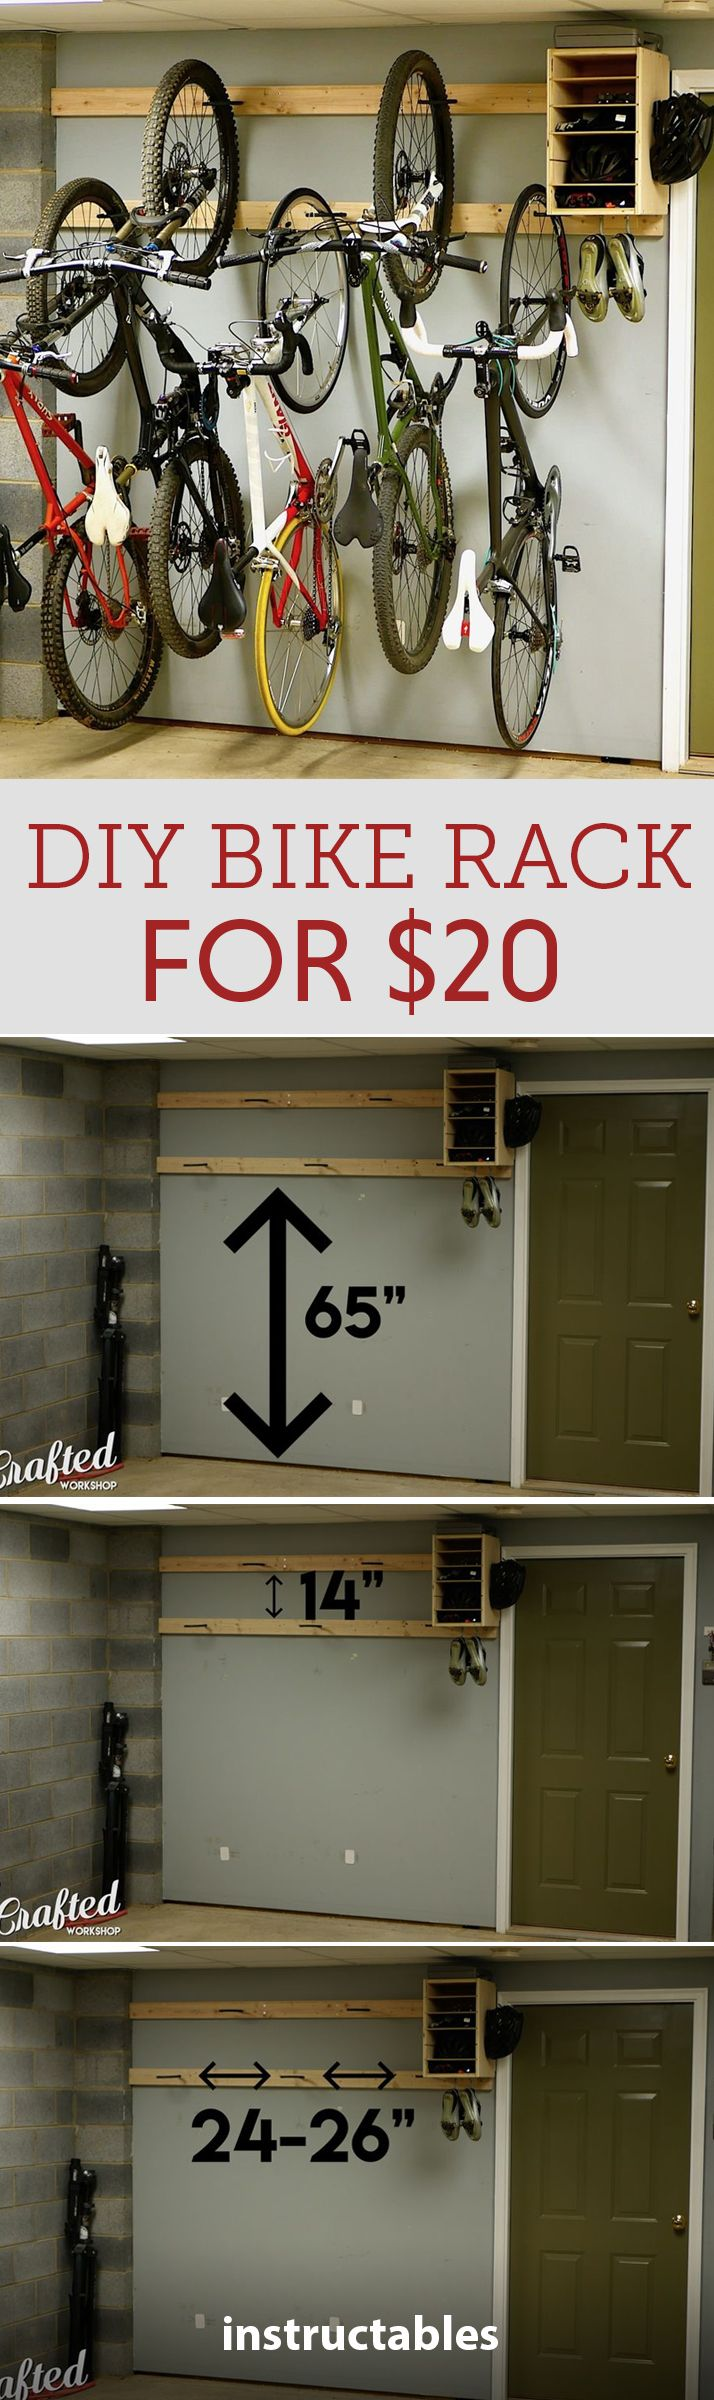 diy bike rack for 20 bike storage stand cabinet for garage